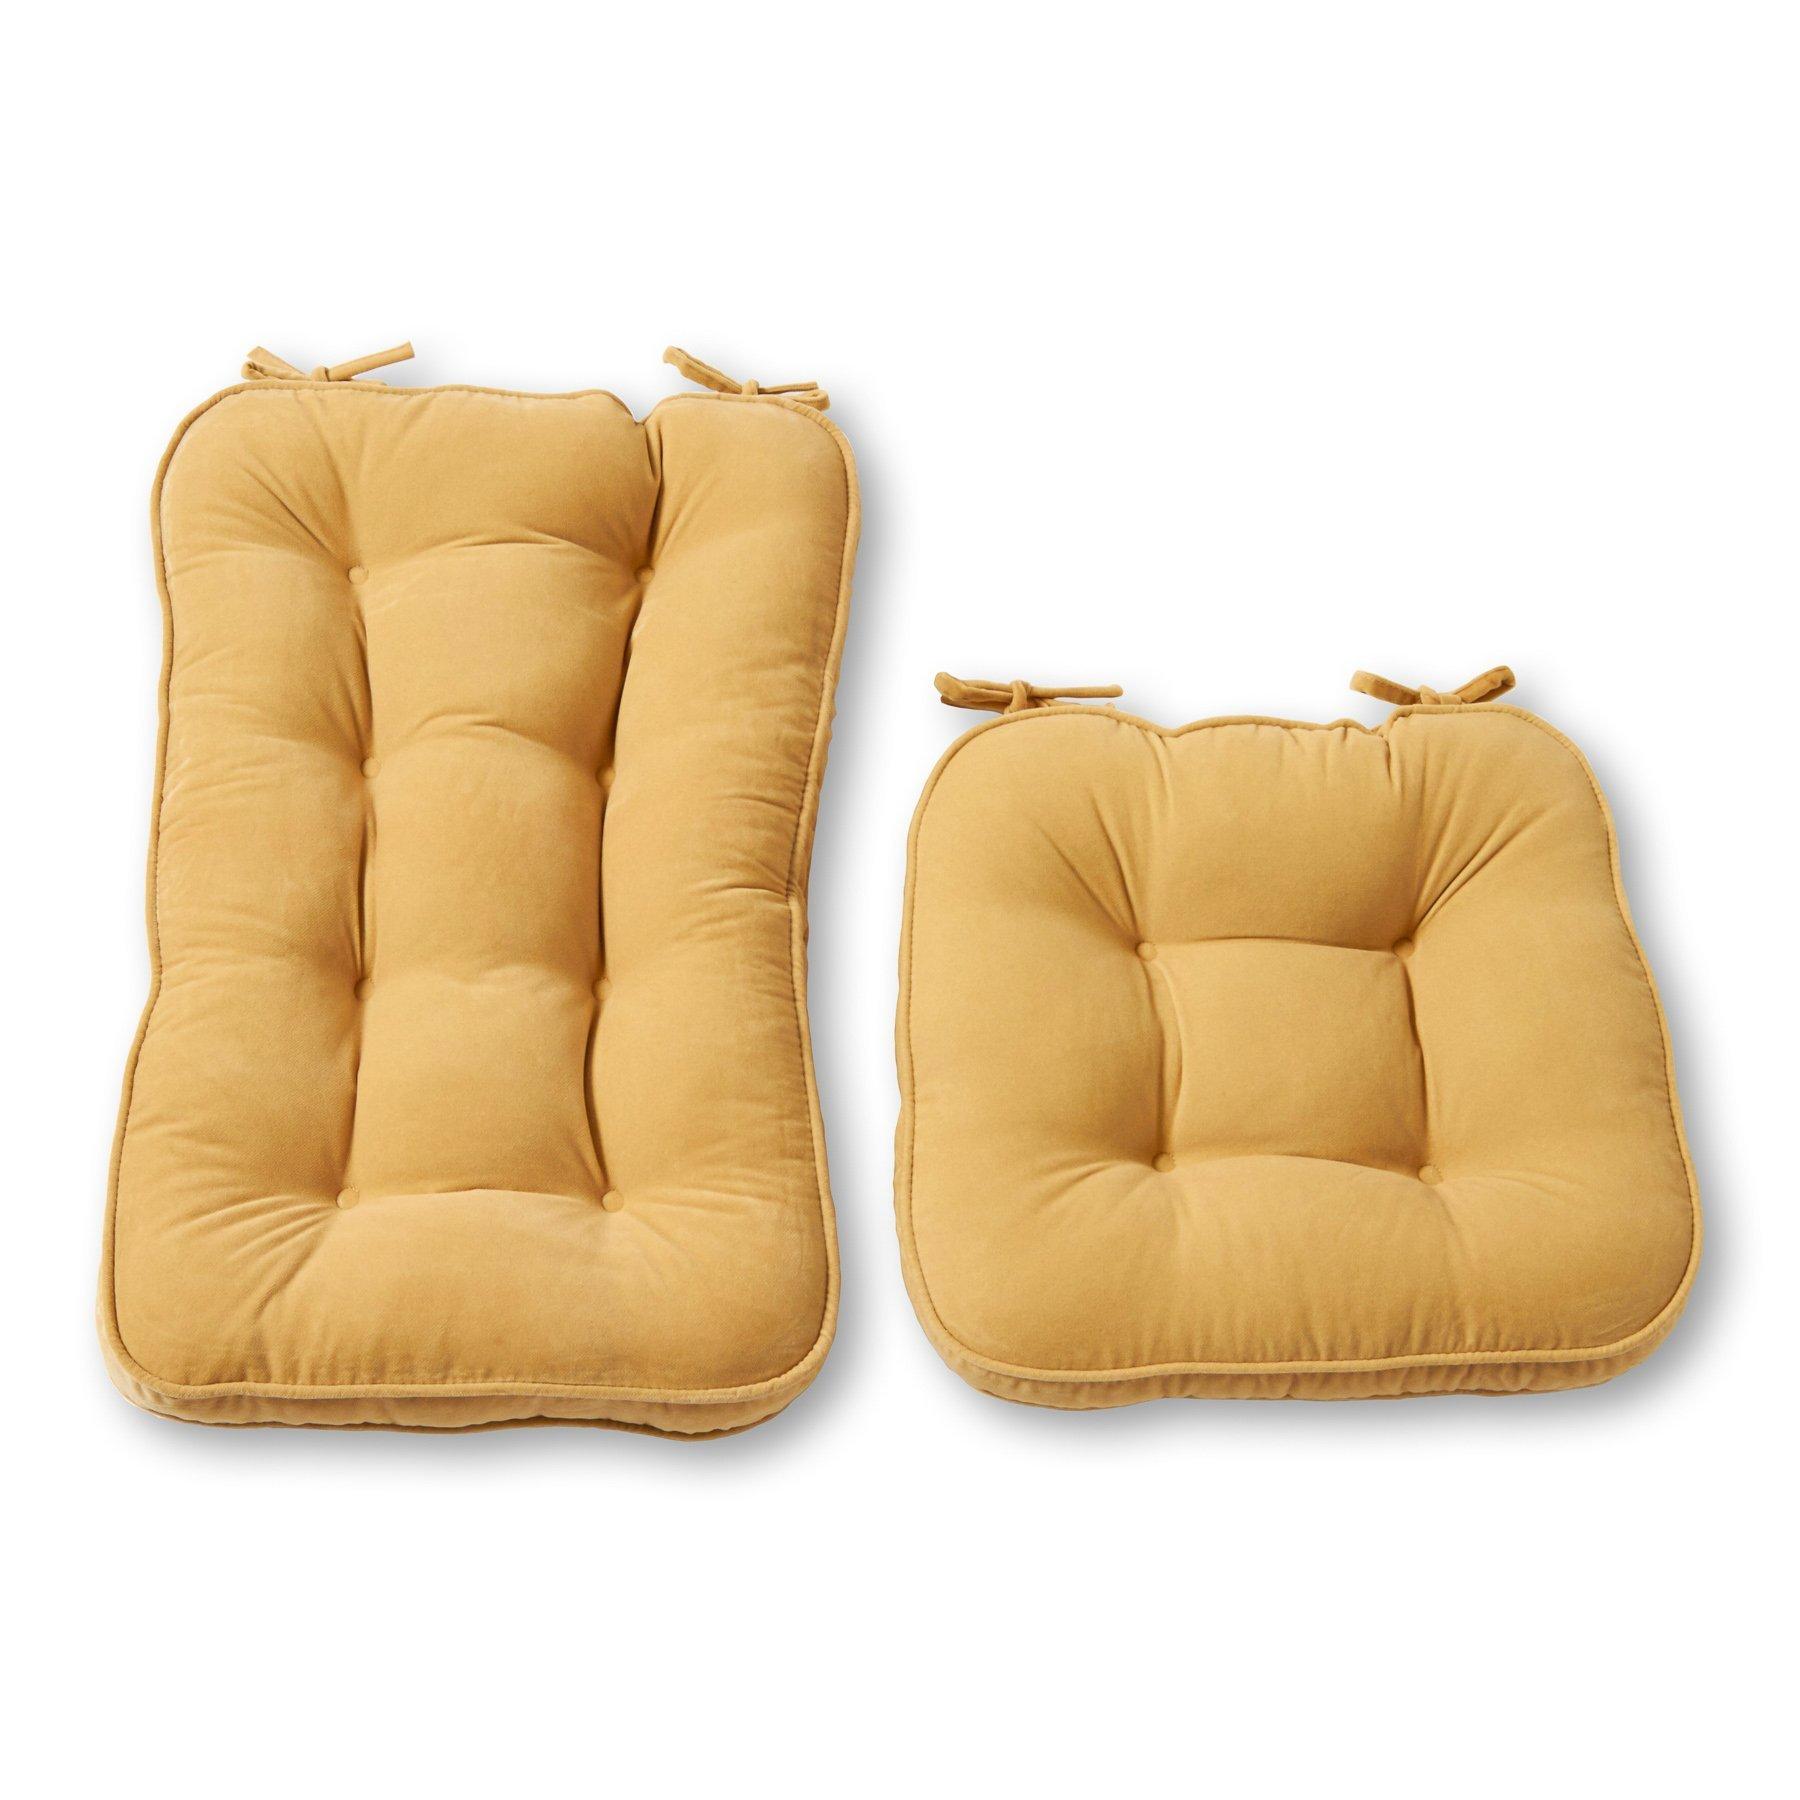 Greendale Home Fashions Jumbo Rocking Chair Cushion Set Hyatt fabric, Cream by Greendale Home Fashions (Image #1)